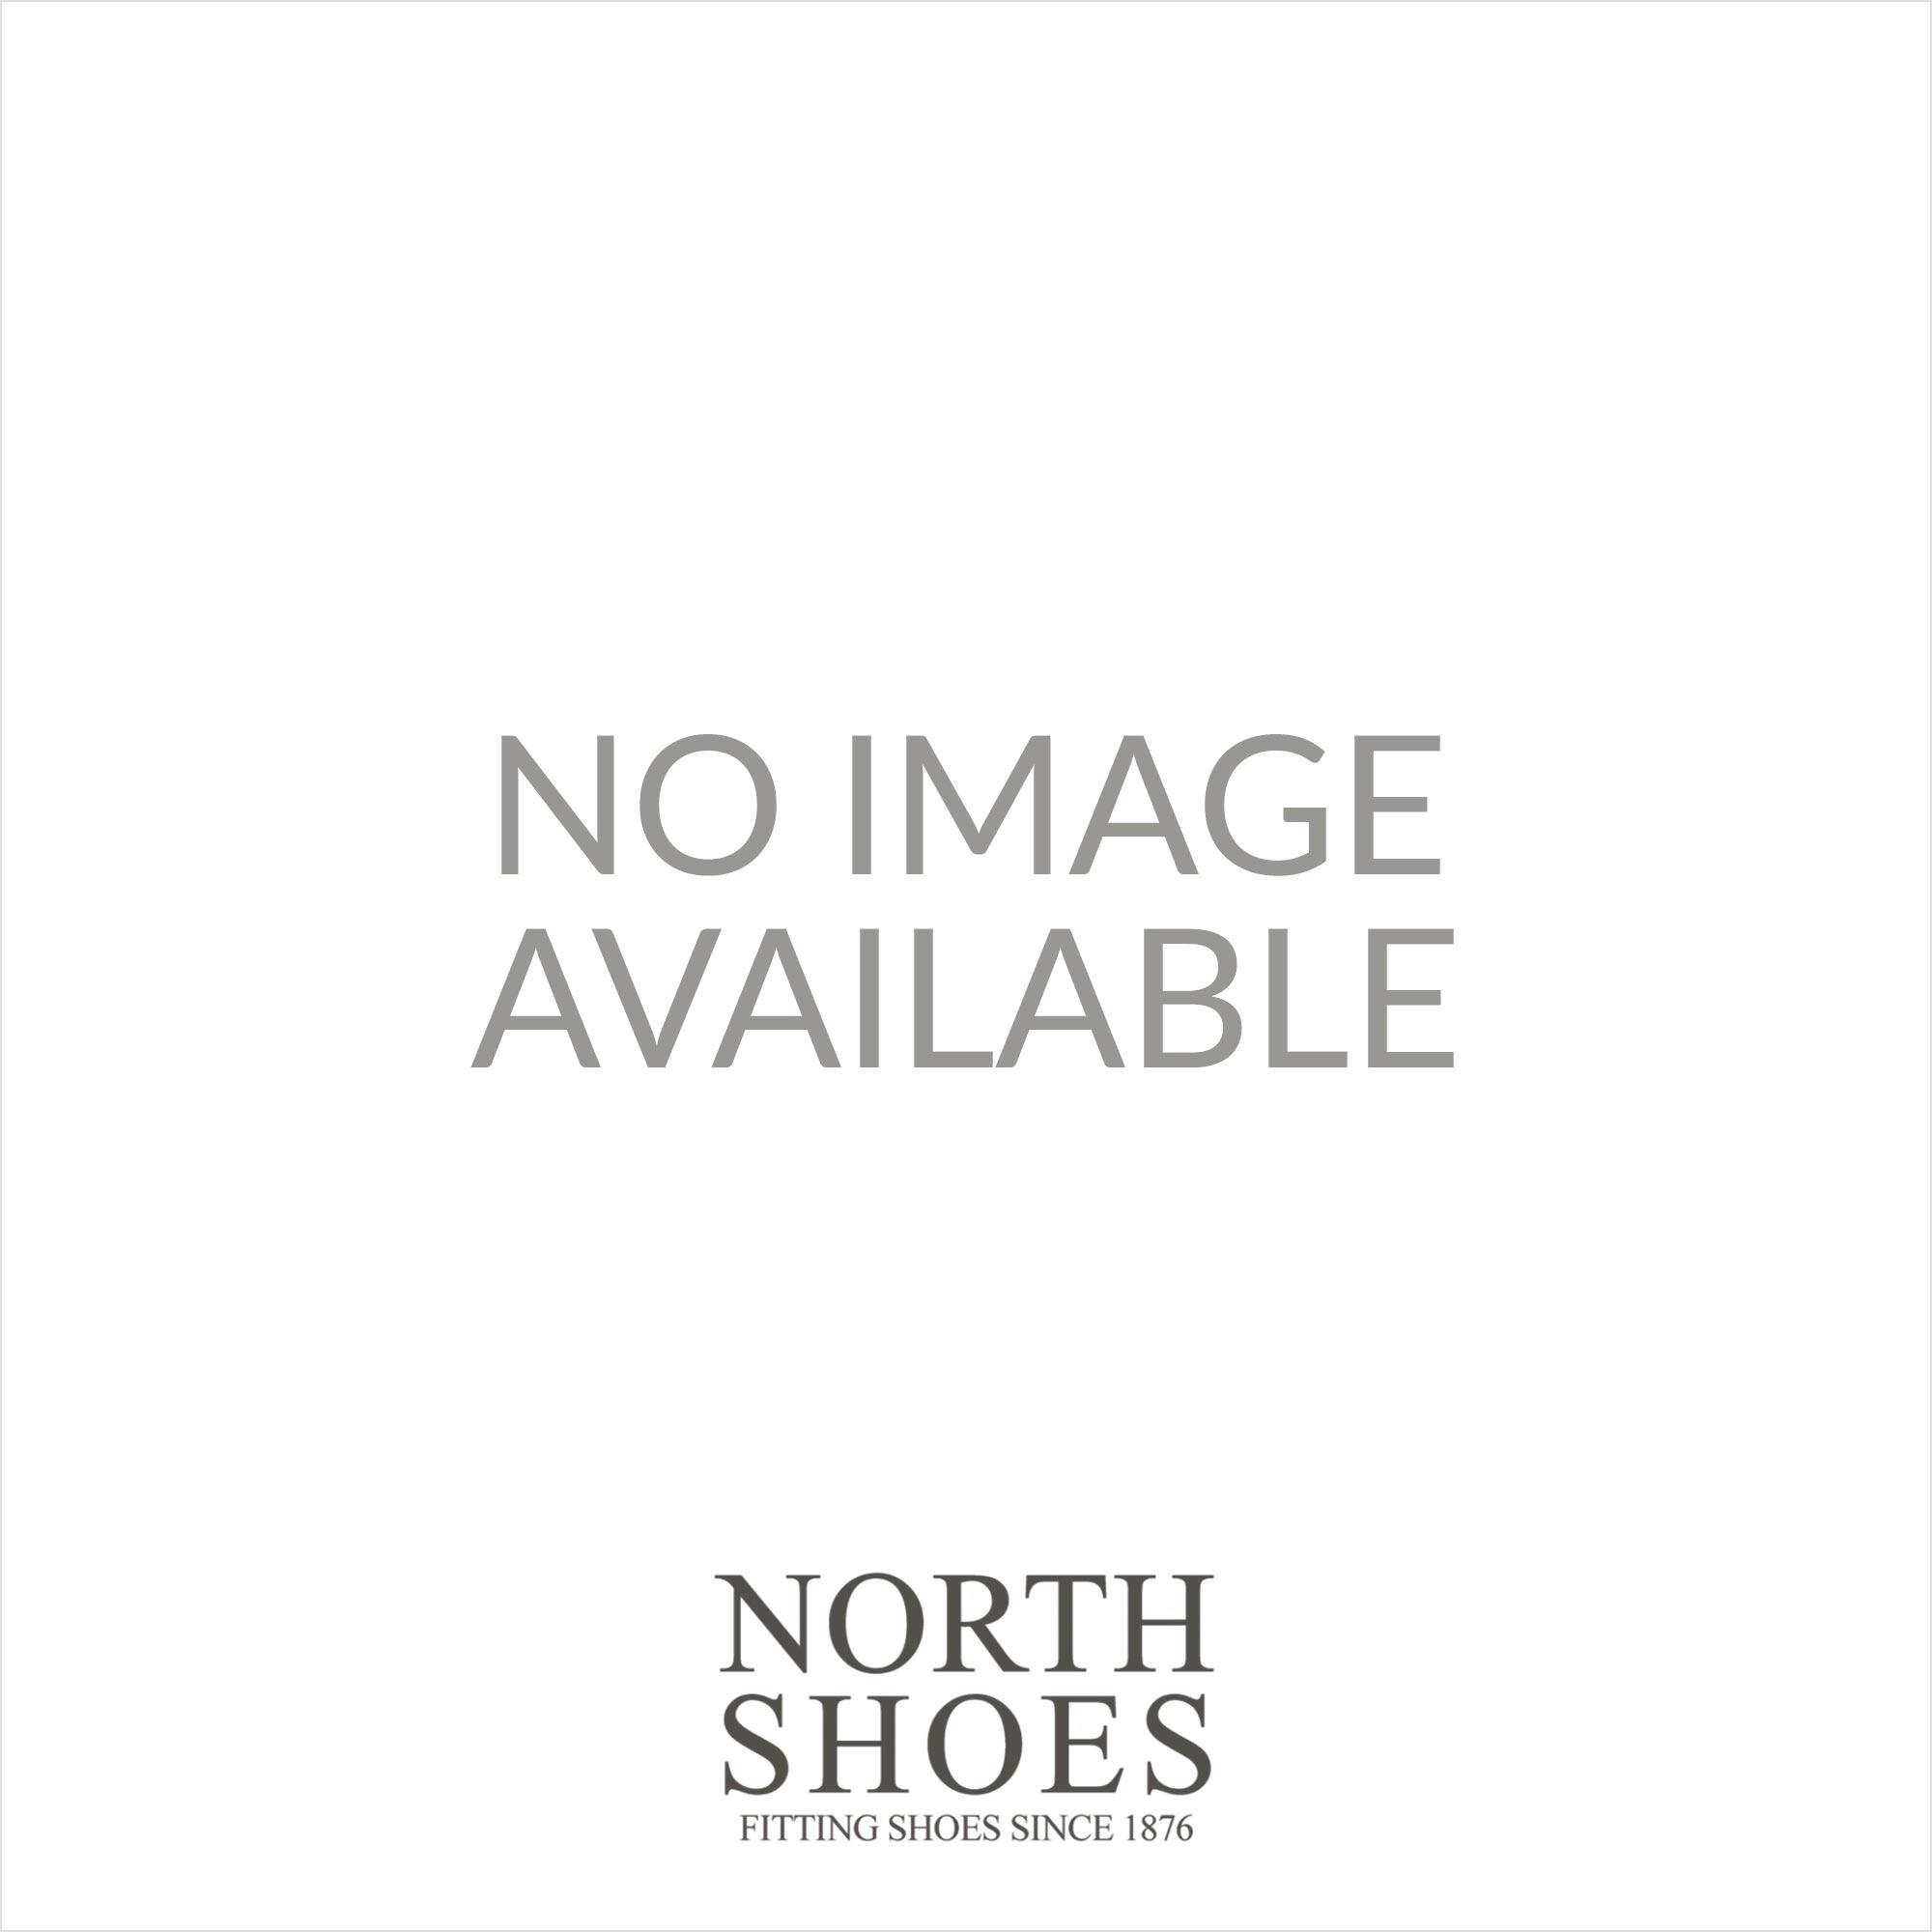 f3ac3057 Mens Clarks Tri Chloe Metallic Silver Leather Womens Slingback ...